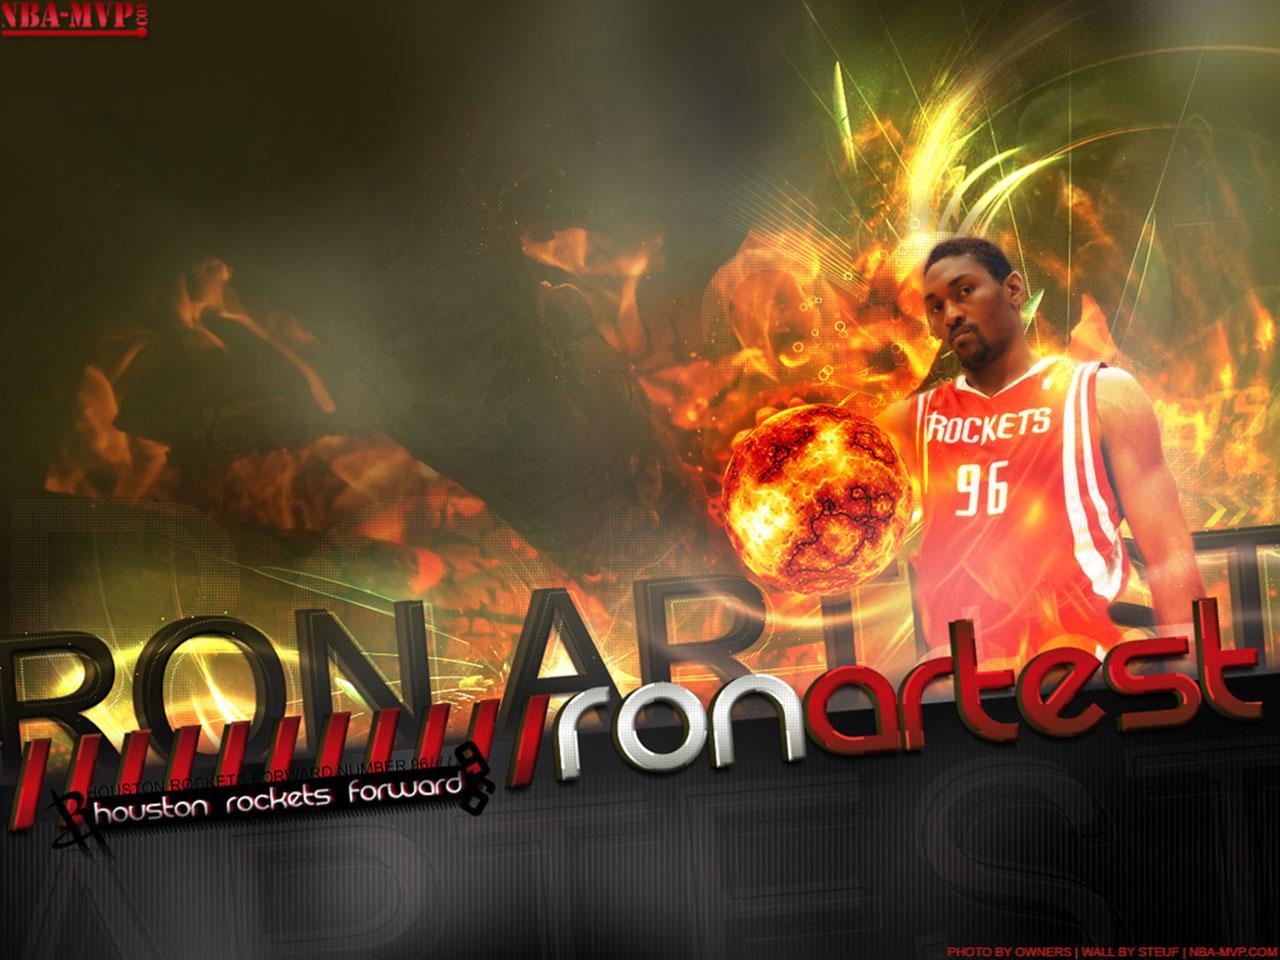 http://1.bp.blogspot.com/_0_IbsH3Iw48/TNn8S_rz7vI/AAAAAAAADHU/MQGtcQwAGug/s1600/Ron-Artest-Rockets-Wallpaper.jpg